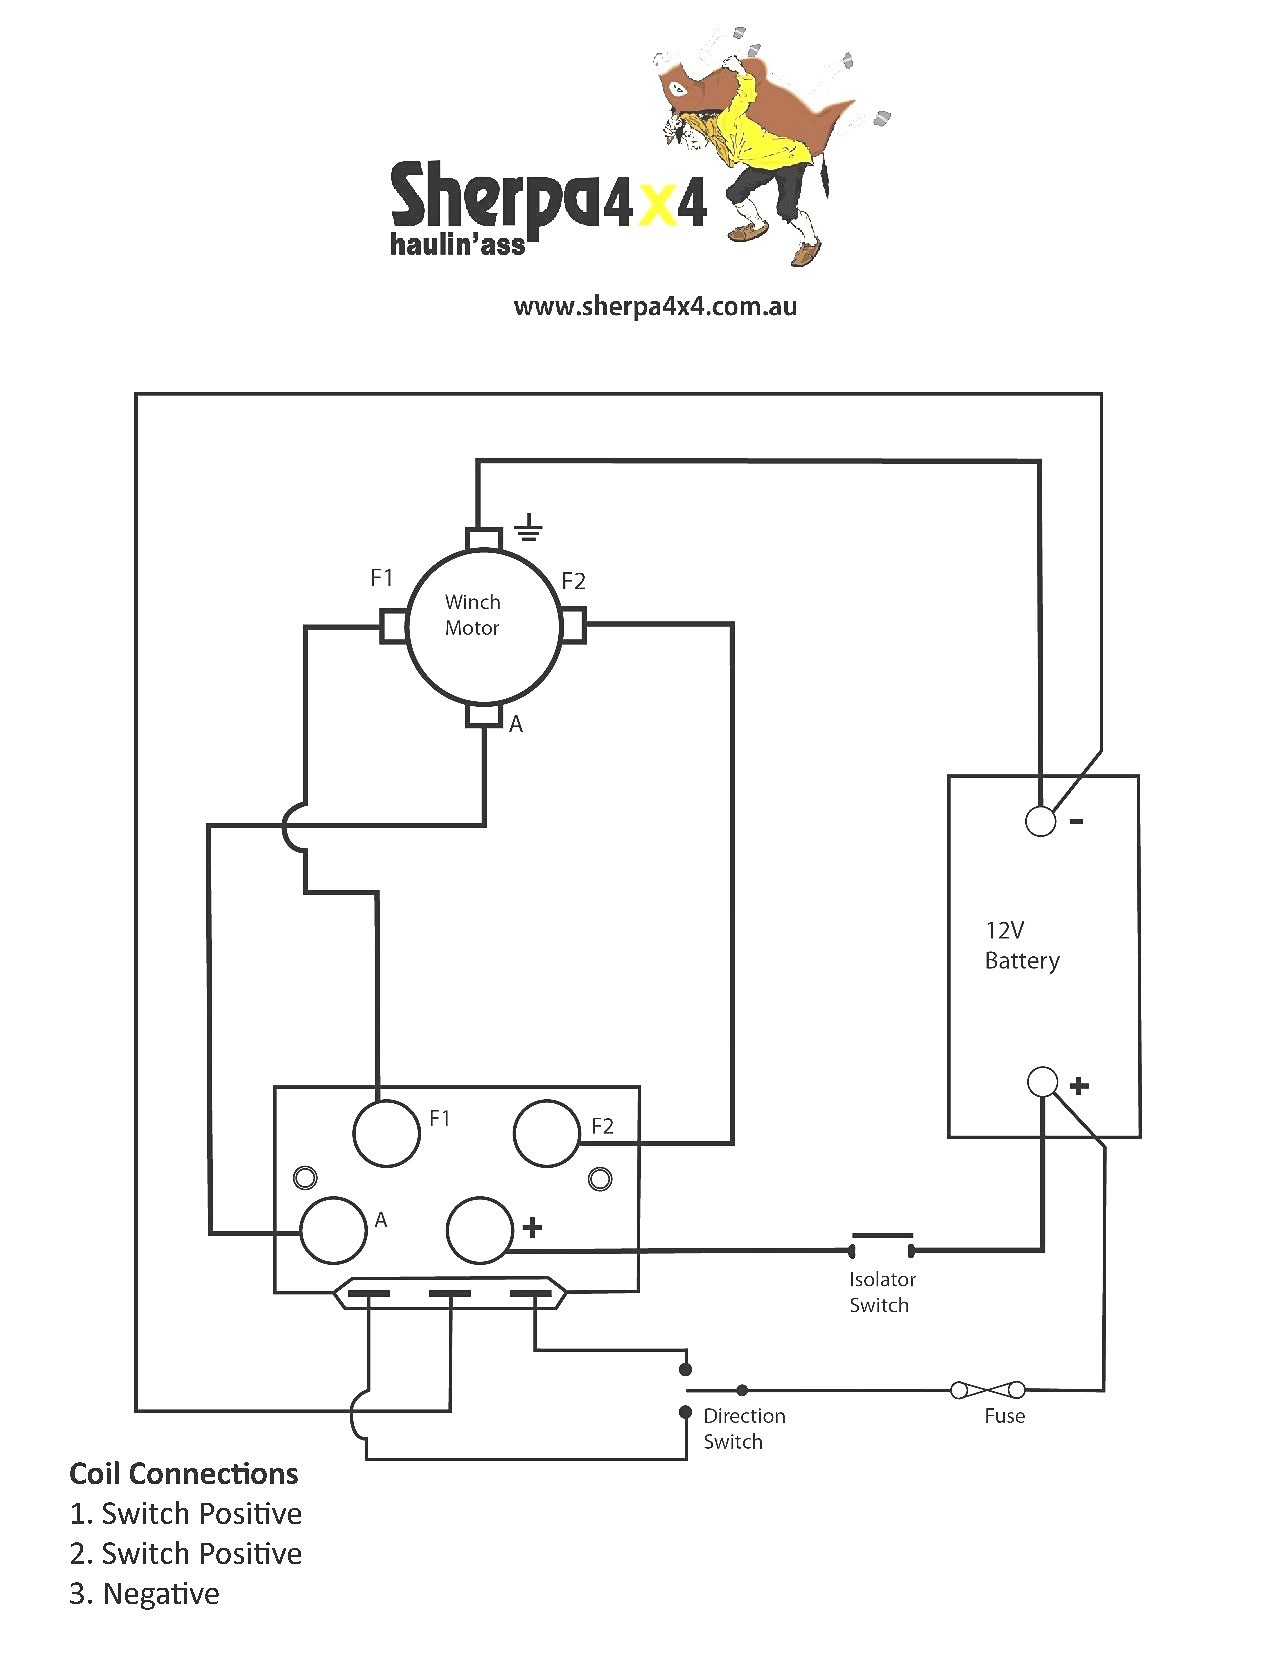 Tf Kfi Contactor Wiring Diagram Schematic Wiring